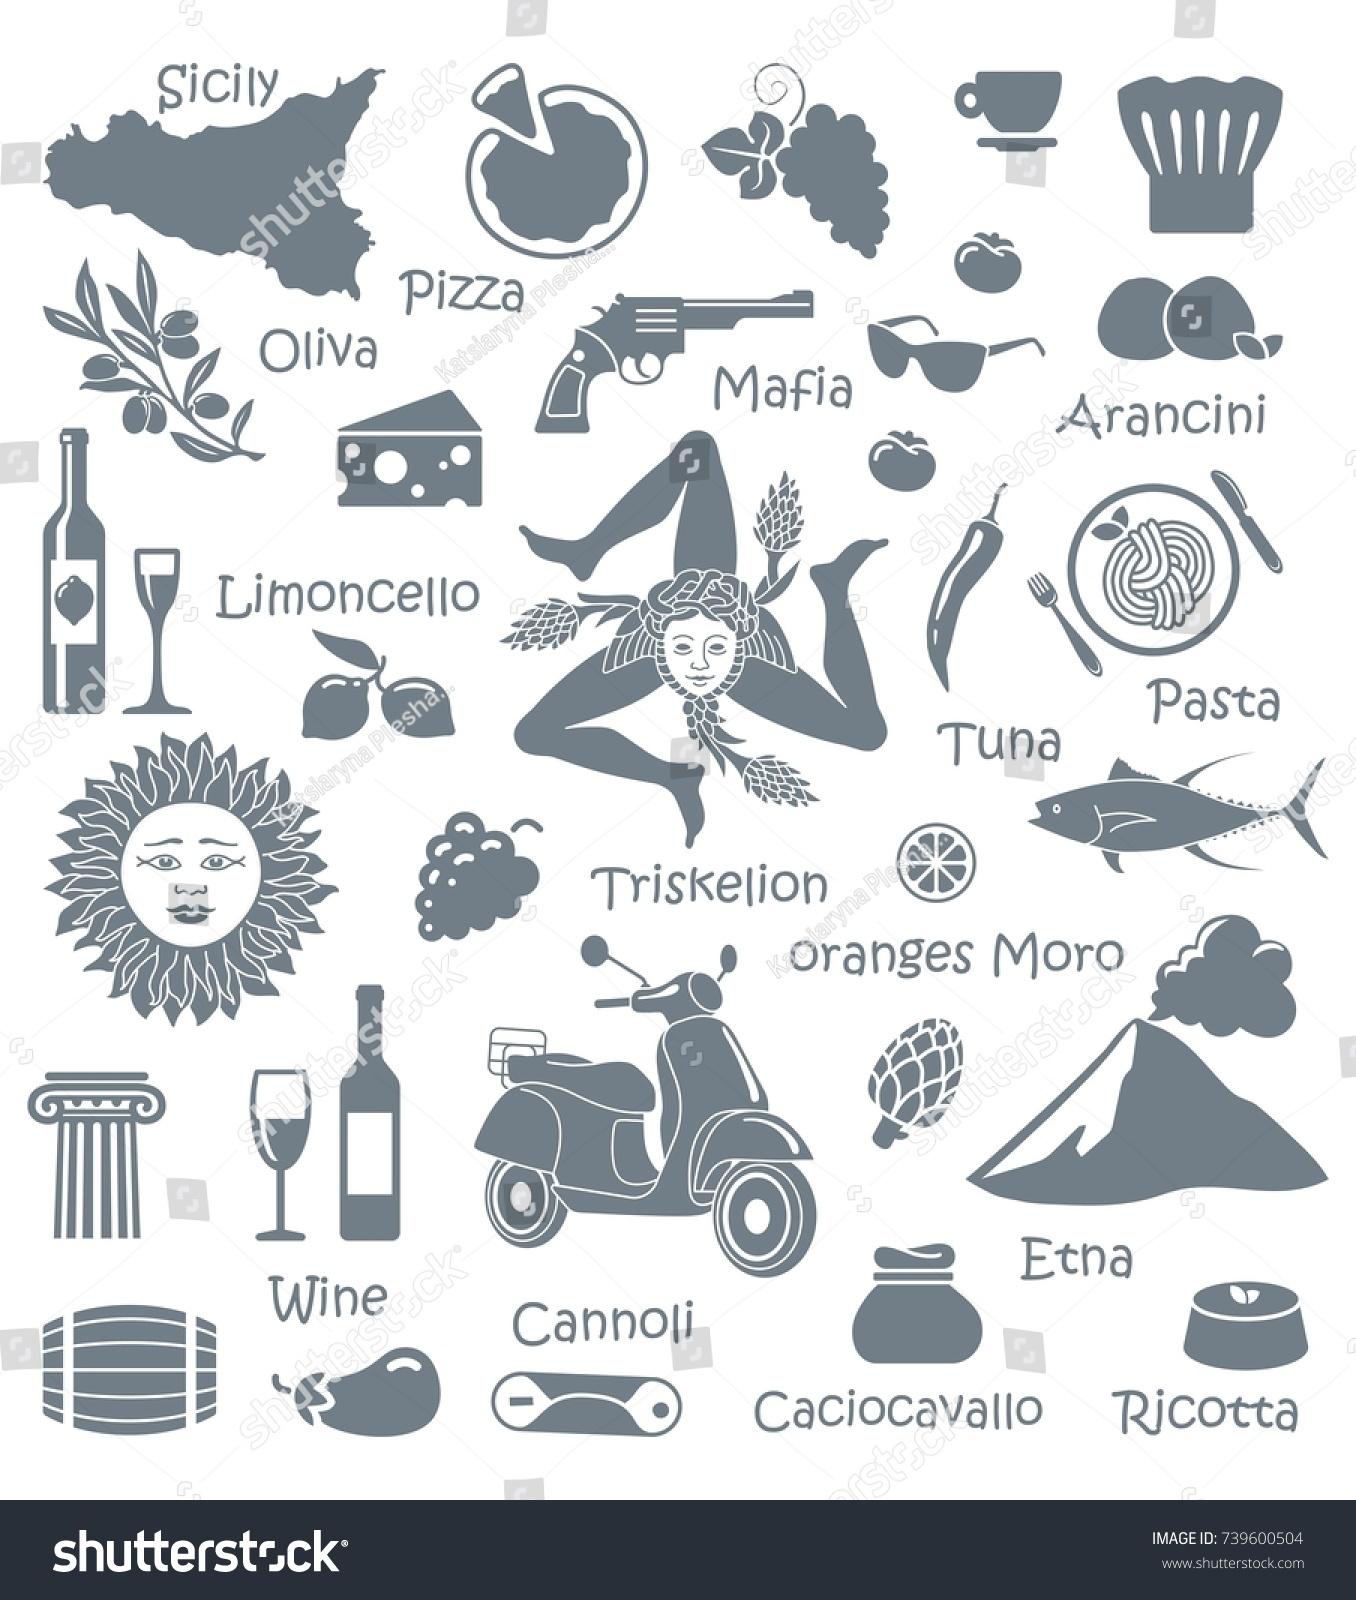 Traditional Symbols Nature Cuisine Culture Sicily Stock Vector